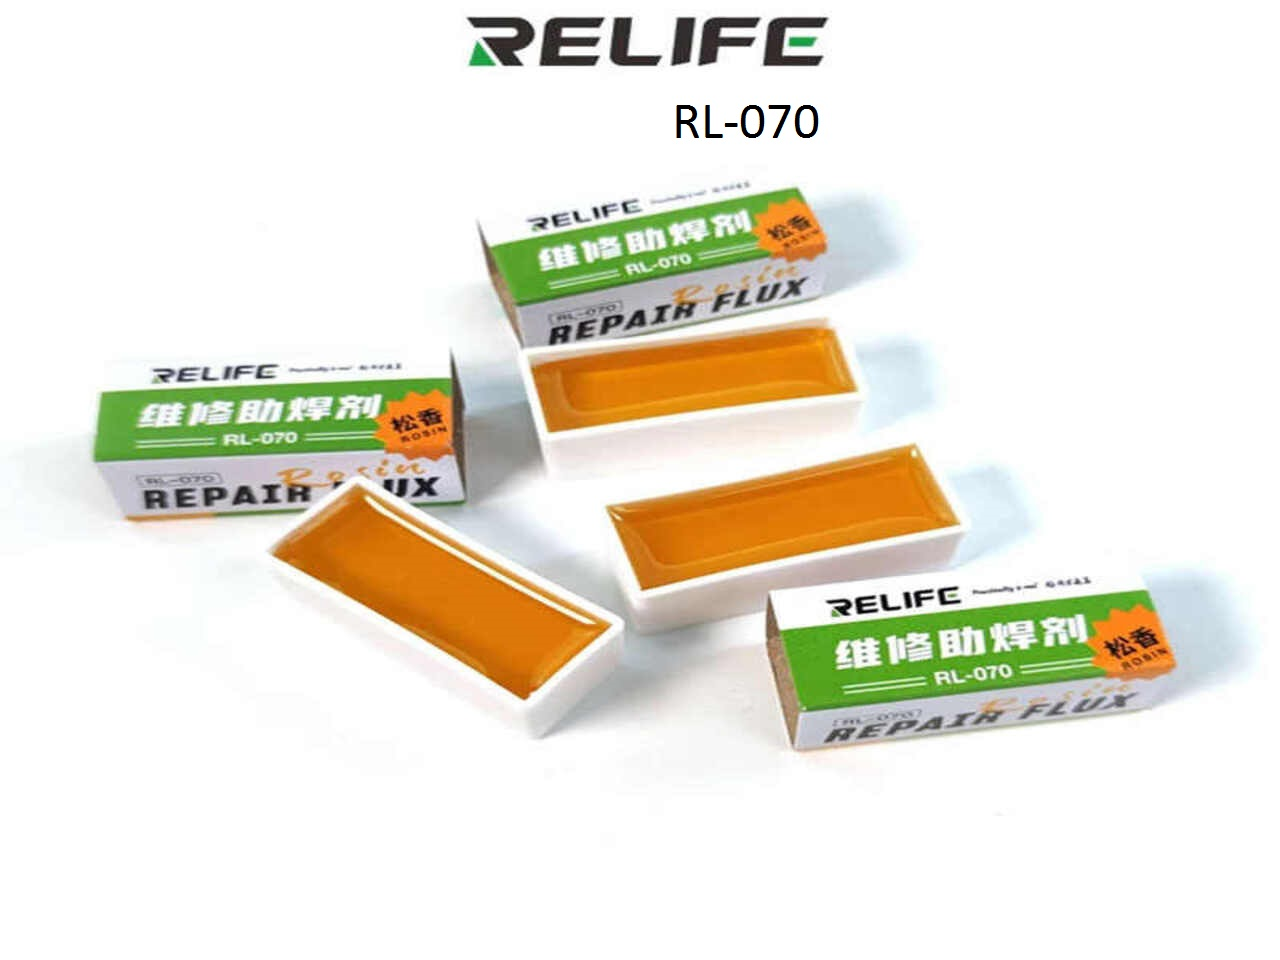 FLUX-ROSIN-RELIFE-RL-070